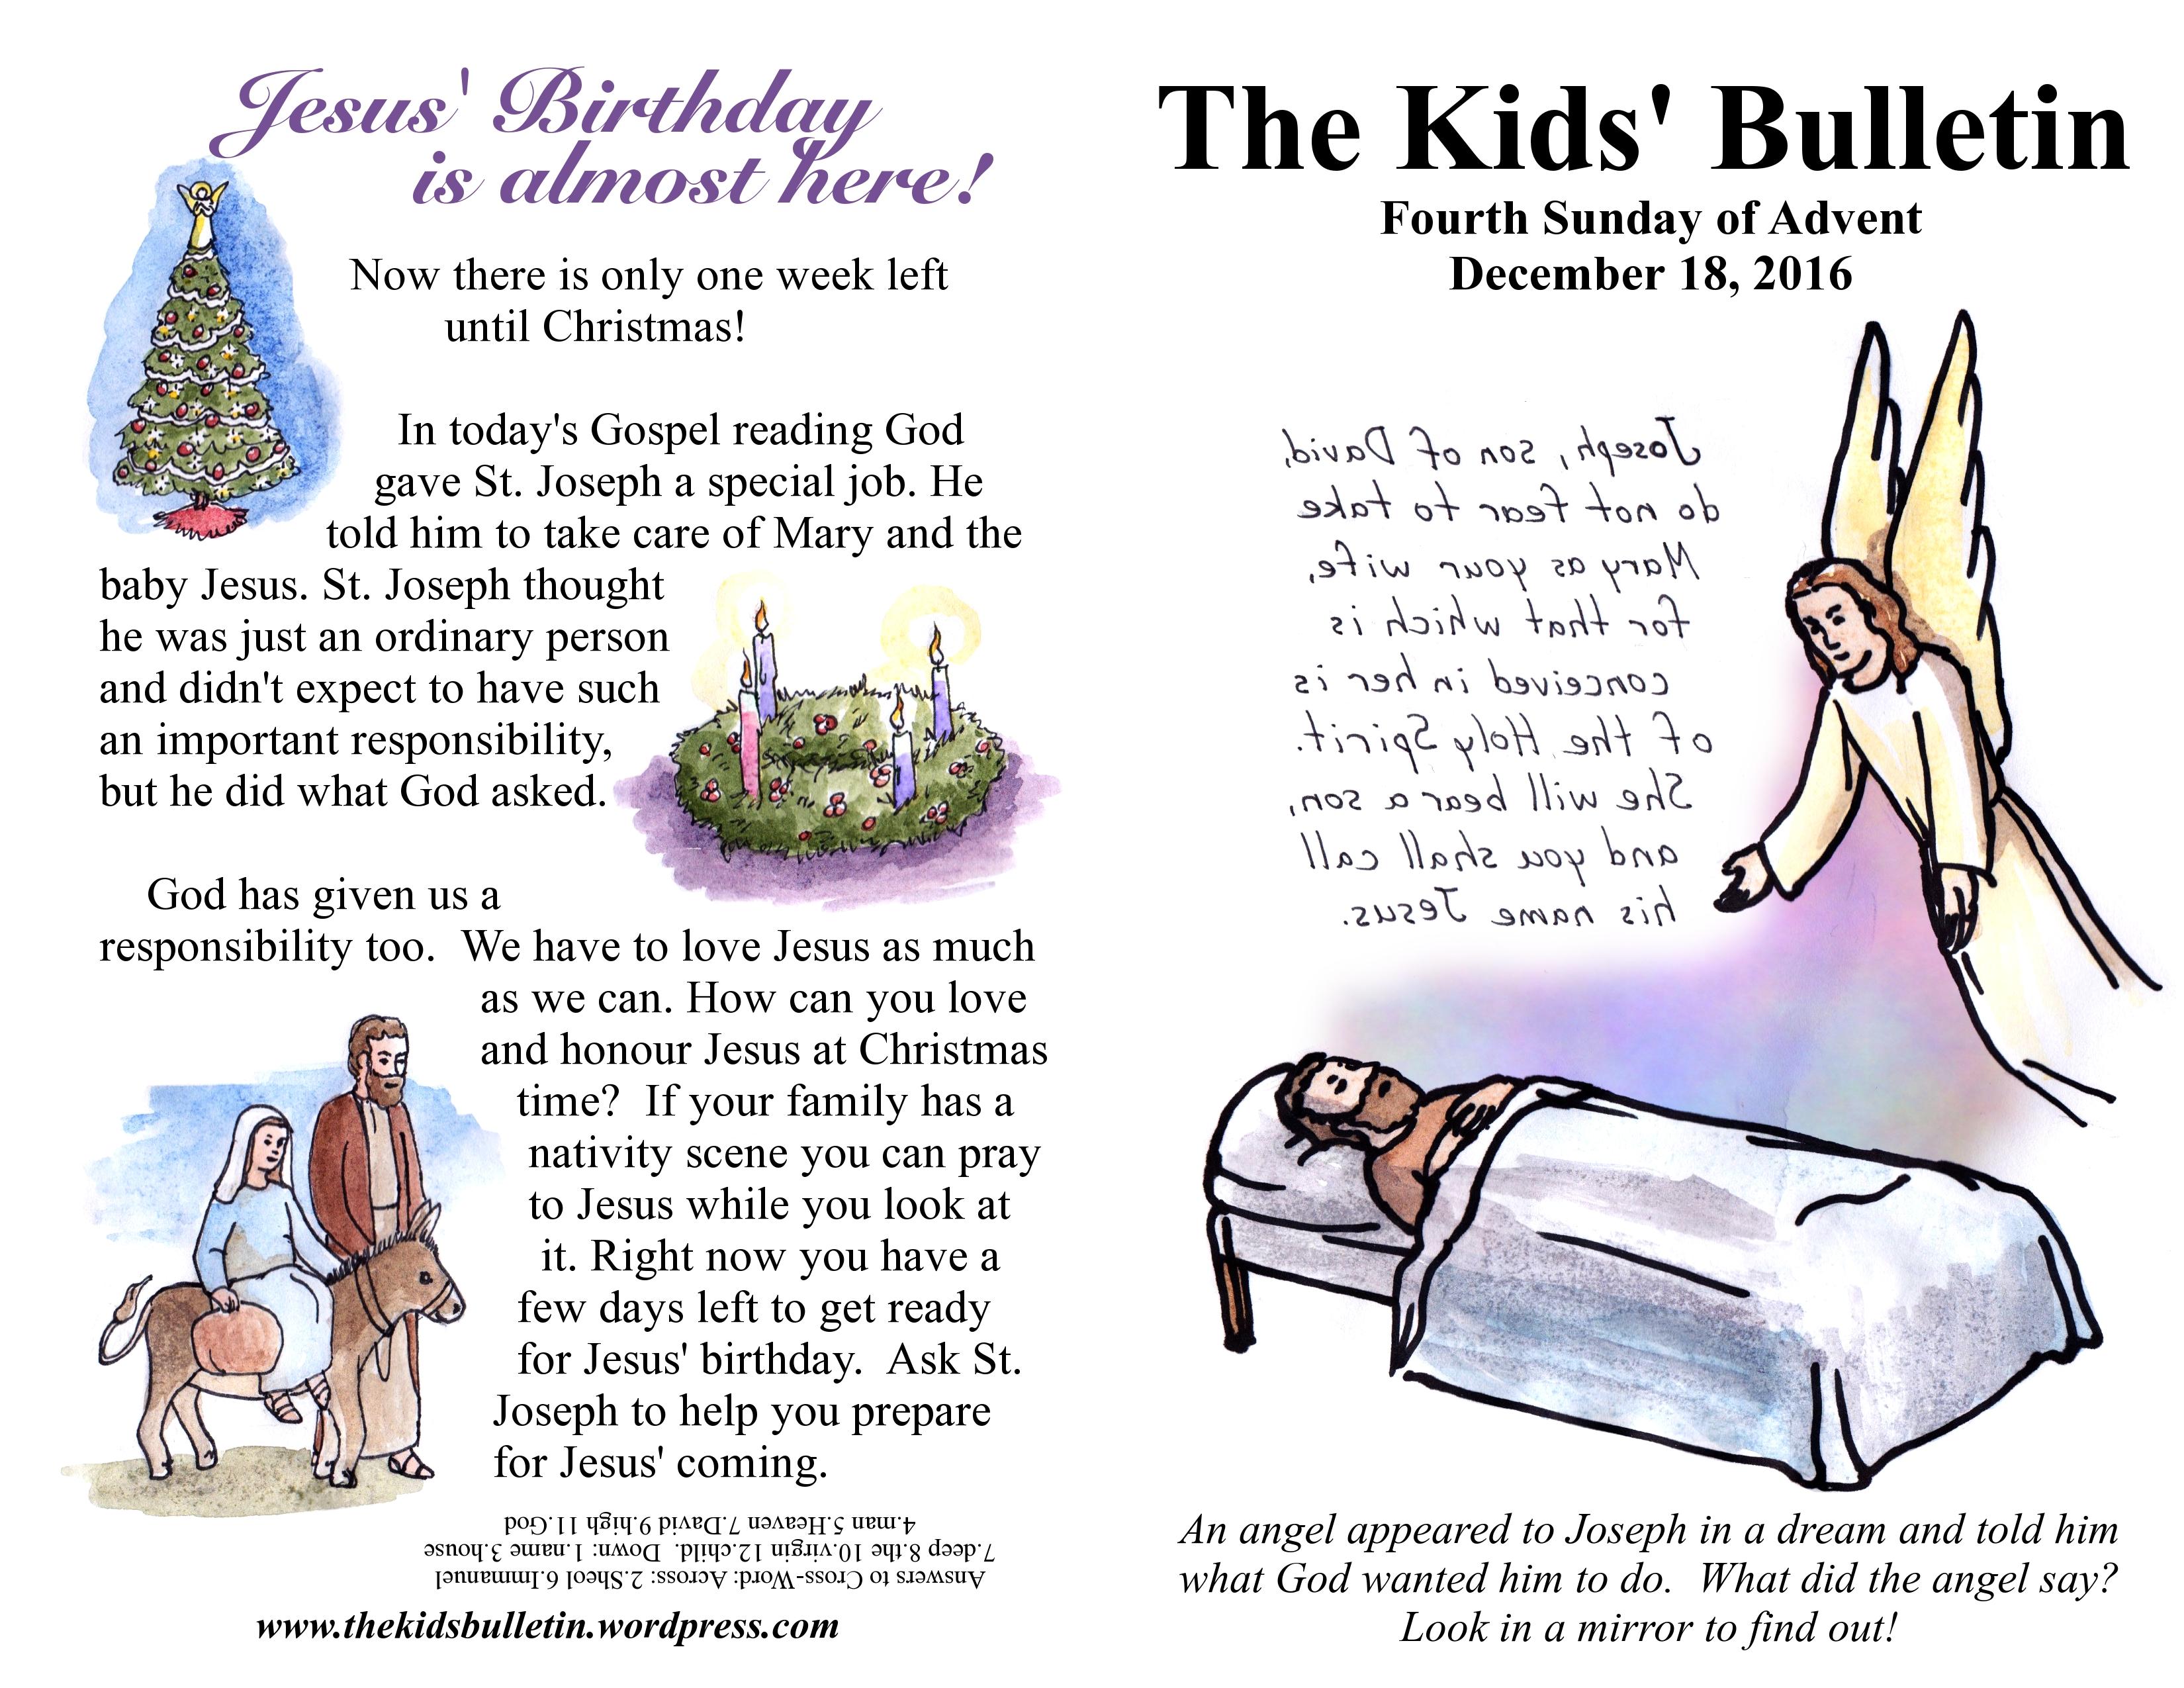 the-kids-bulletin-4th-sunday-of-advent   The Kids' Bulletin